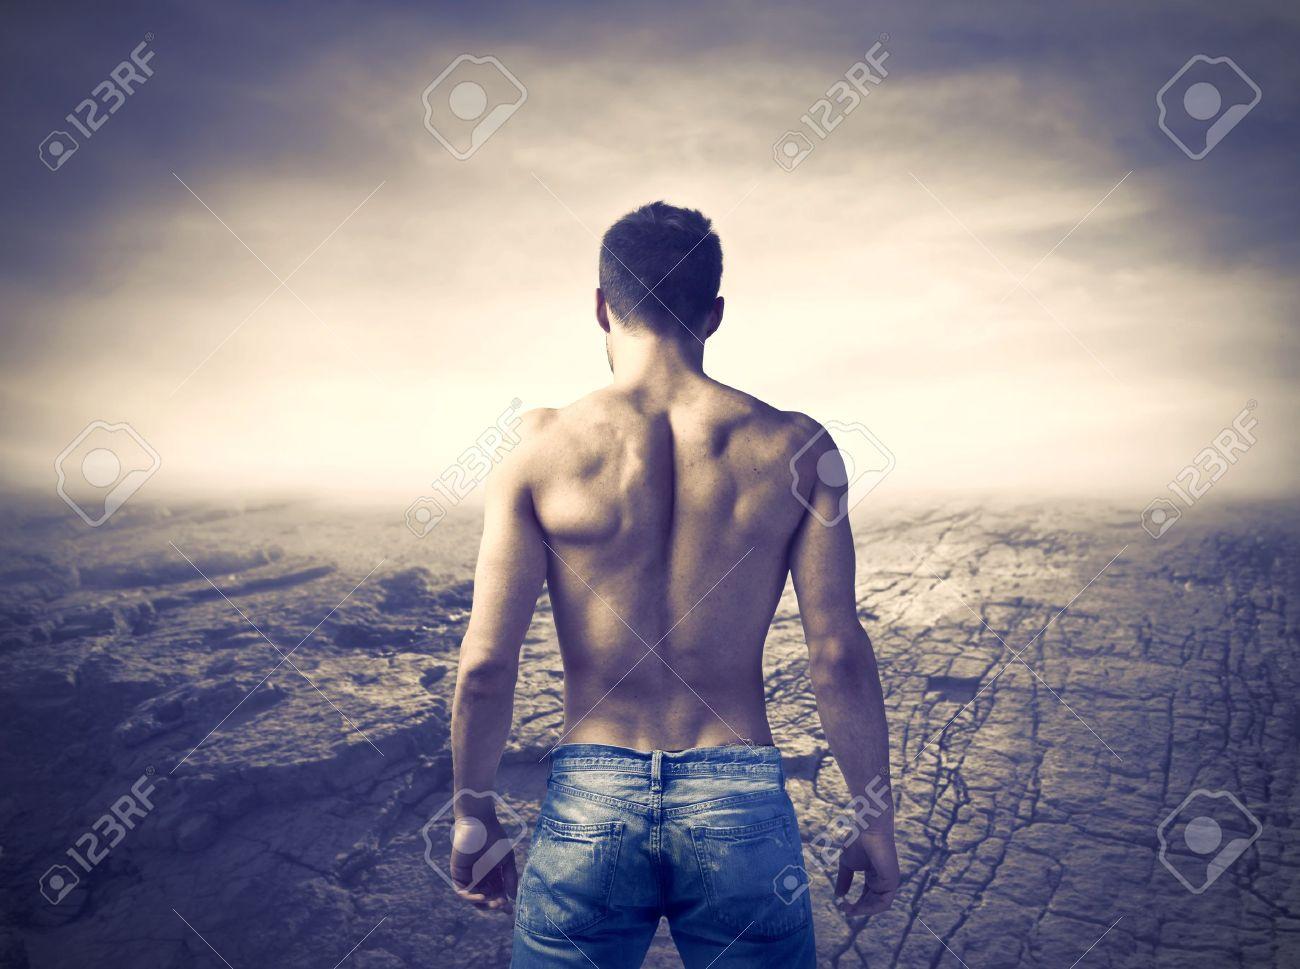 Фотографии когда мужчина сзади 7 фотография